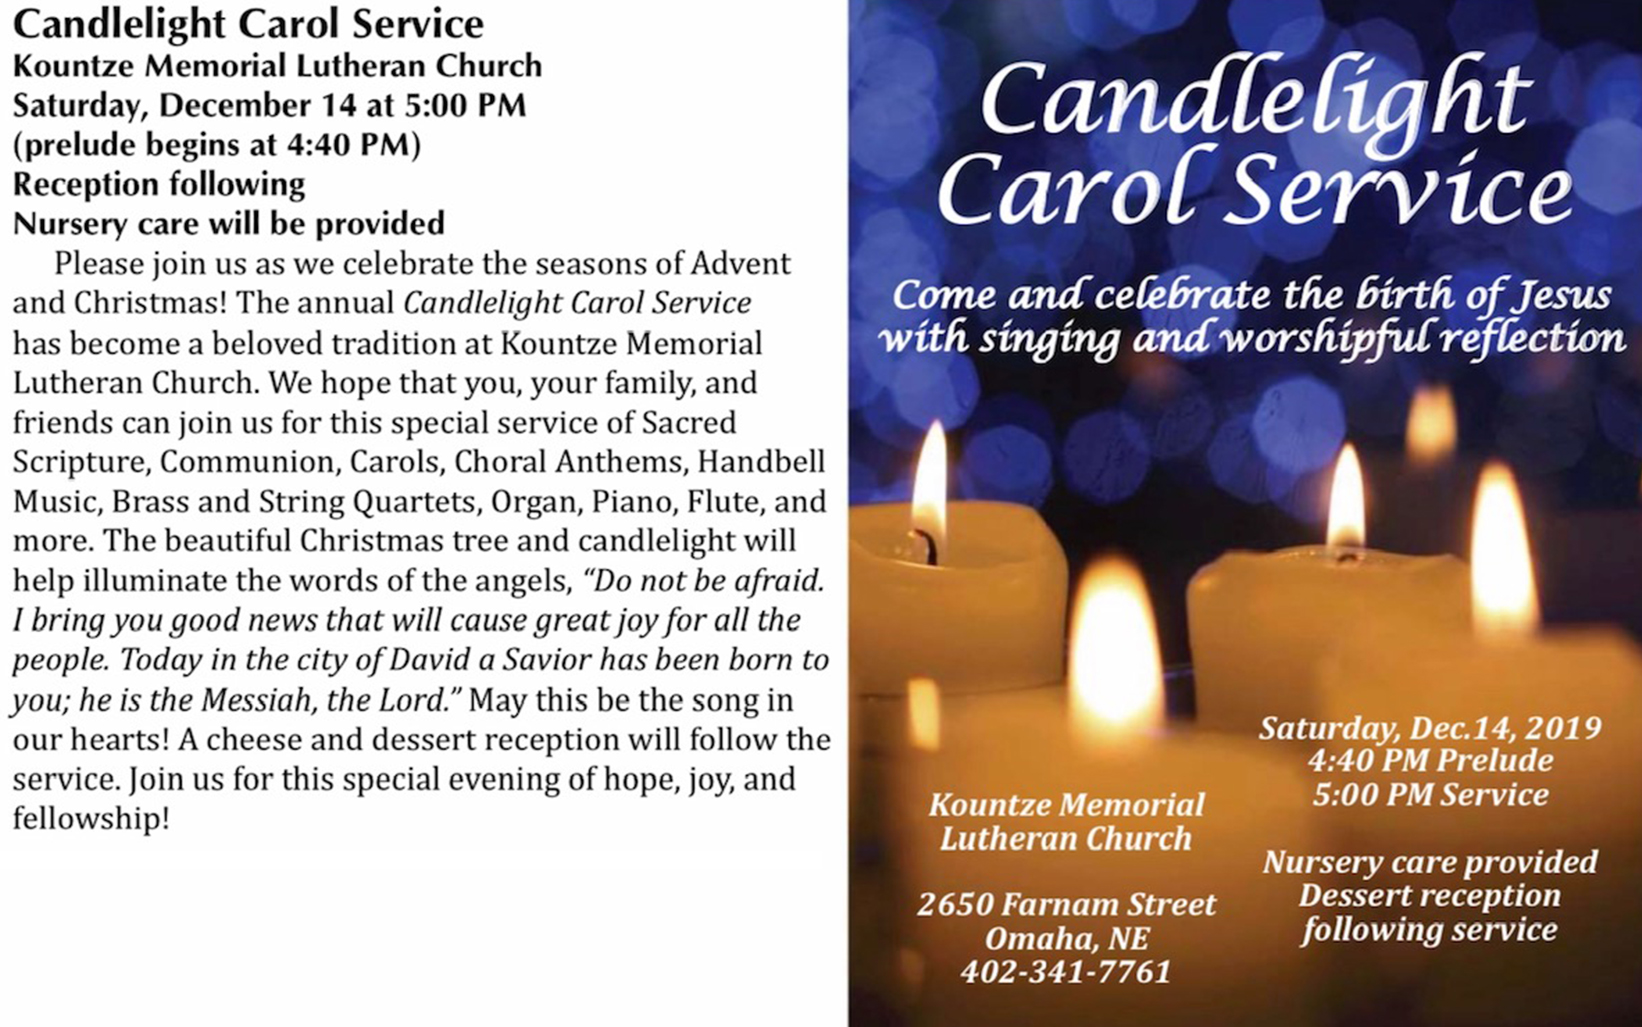 Candlelight Carol Service